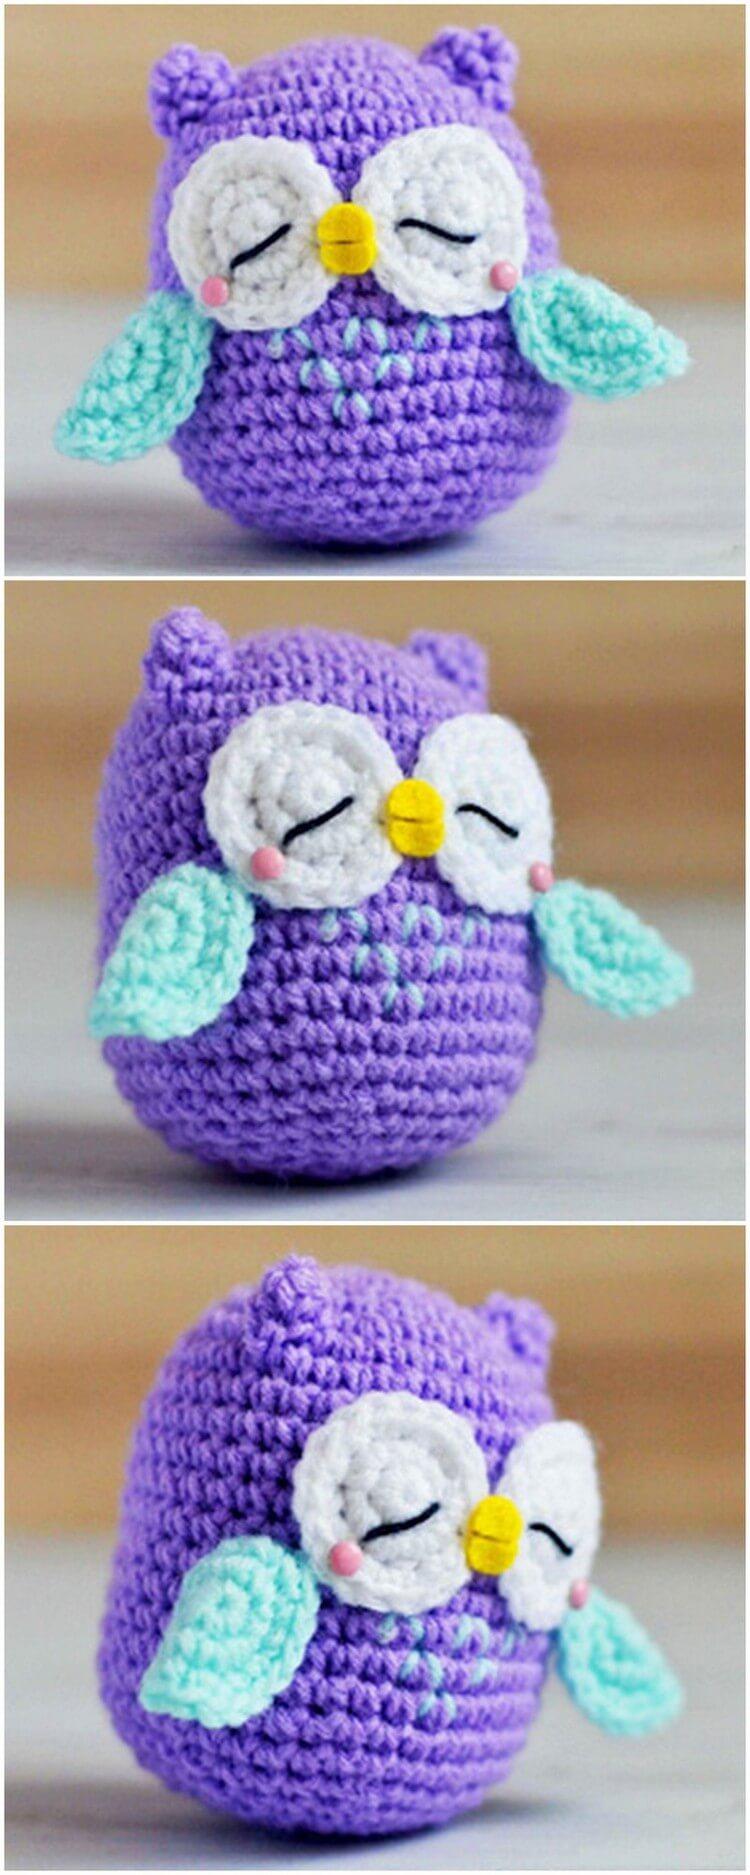 Crochet Amigurumi Pattern (5)